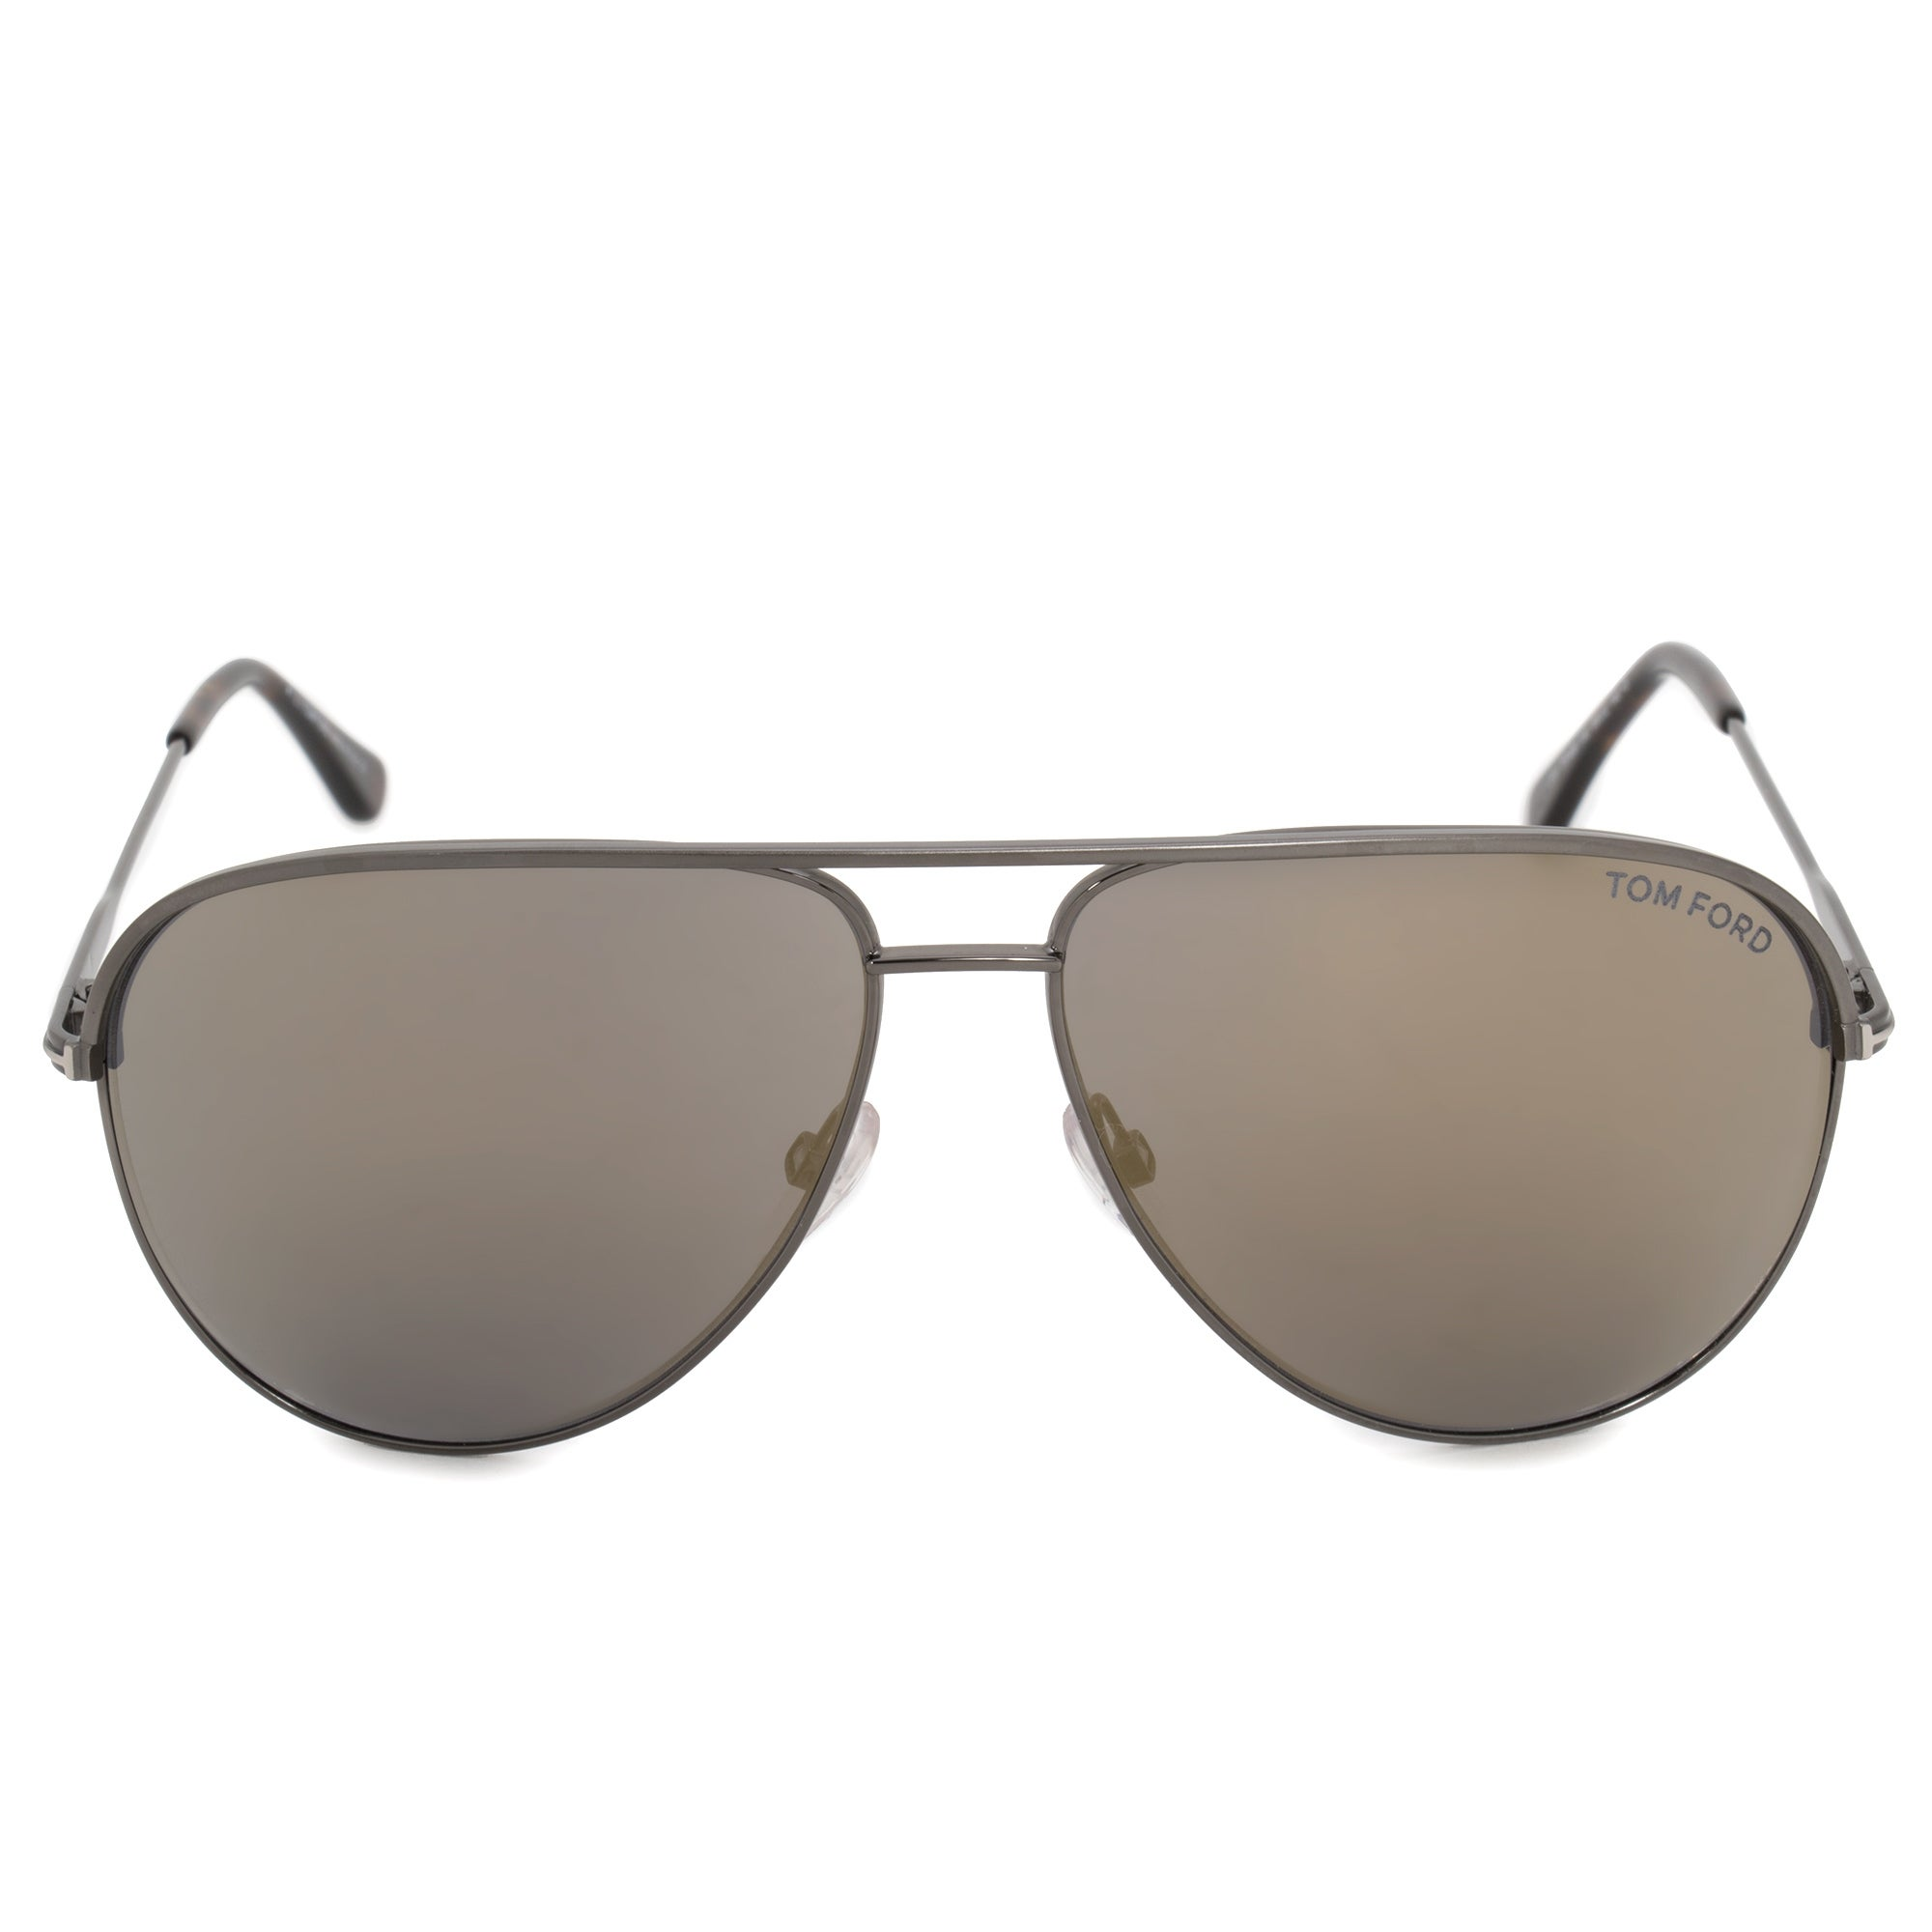 d07d9528e27d0 Shop Tom Ford Erin Aviator Sunglasses FT0466 13C 59 - Free Shipping ...